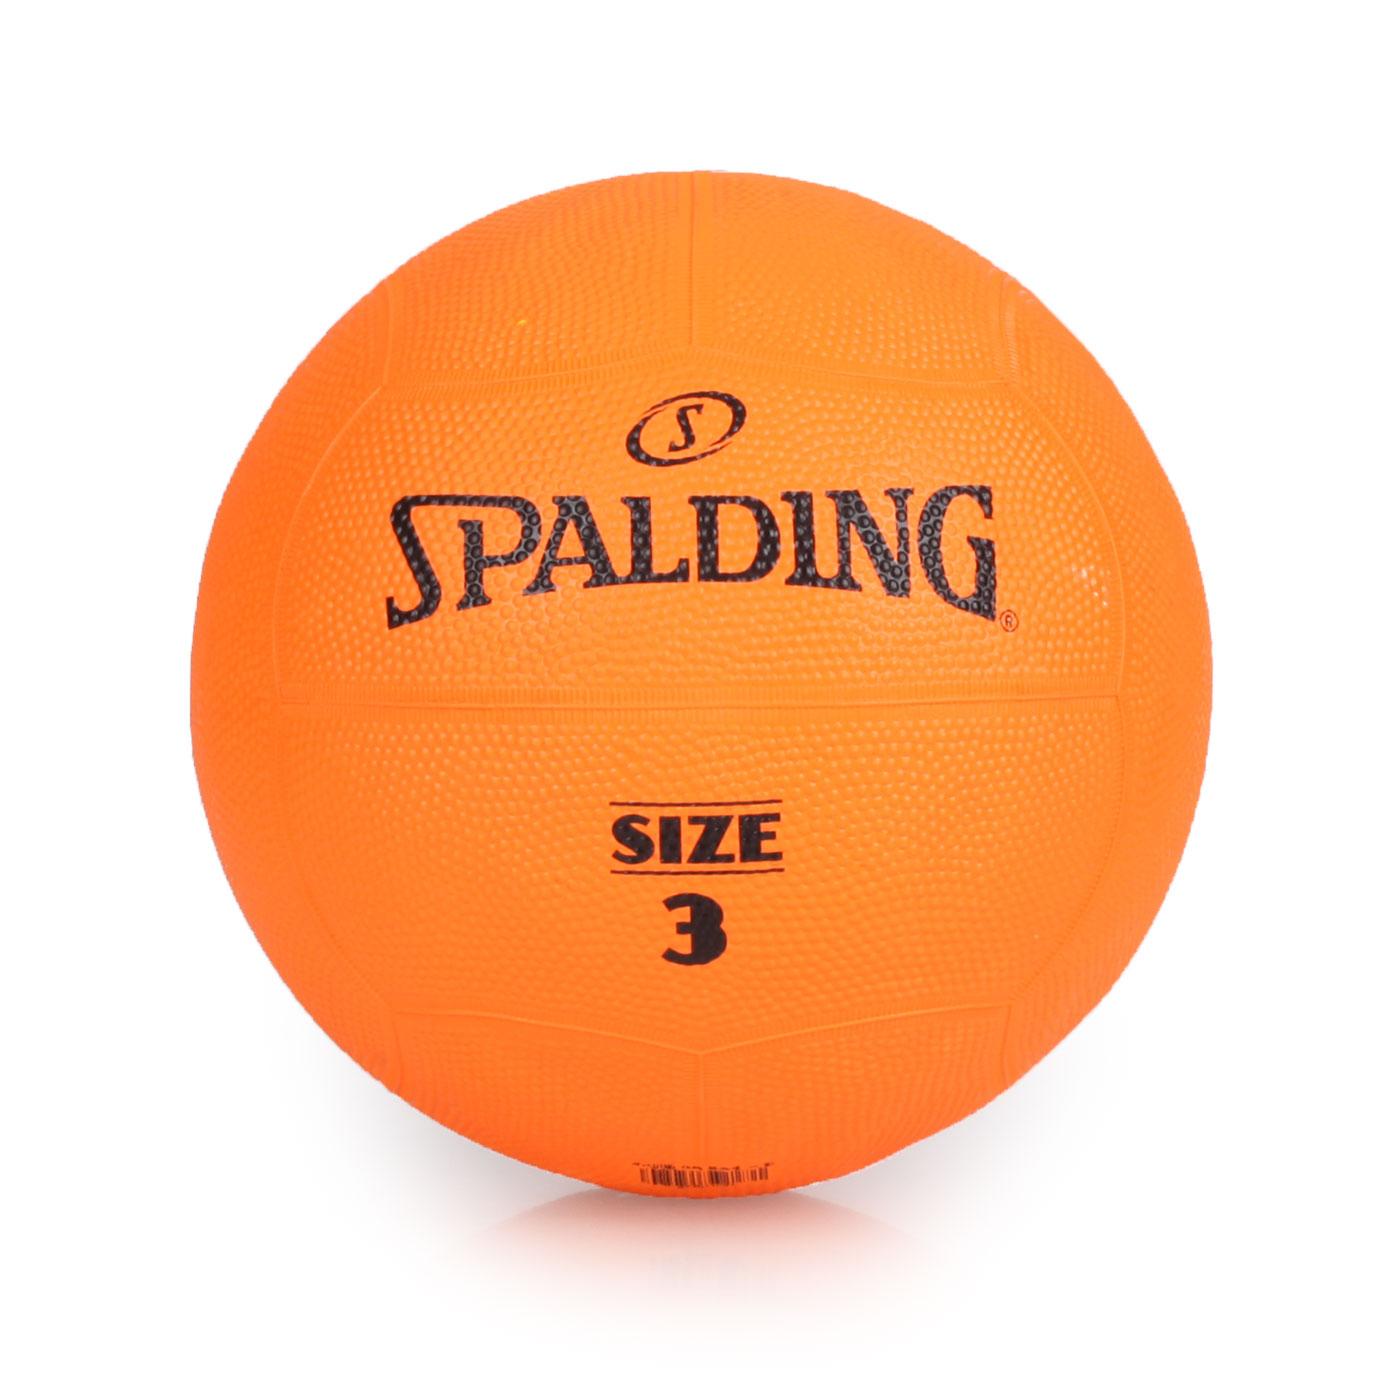 SPALDING Team 躲避球#3 SPBD3001 - 橘黑